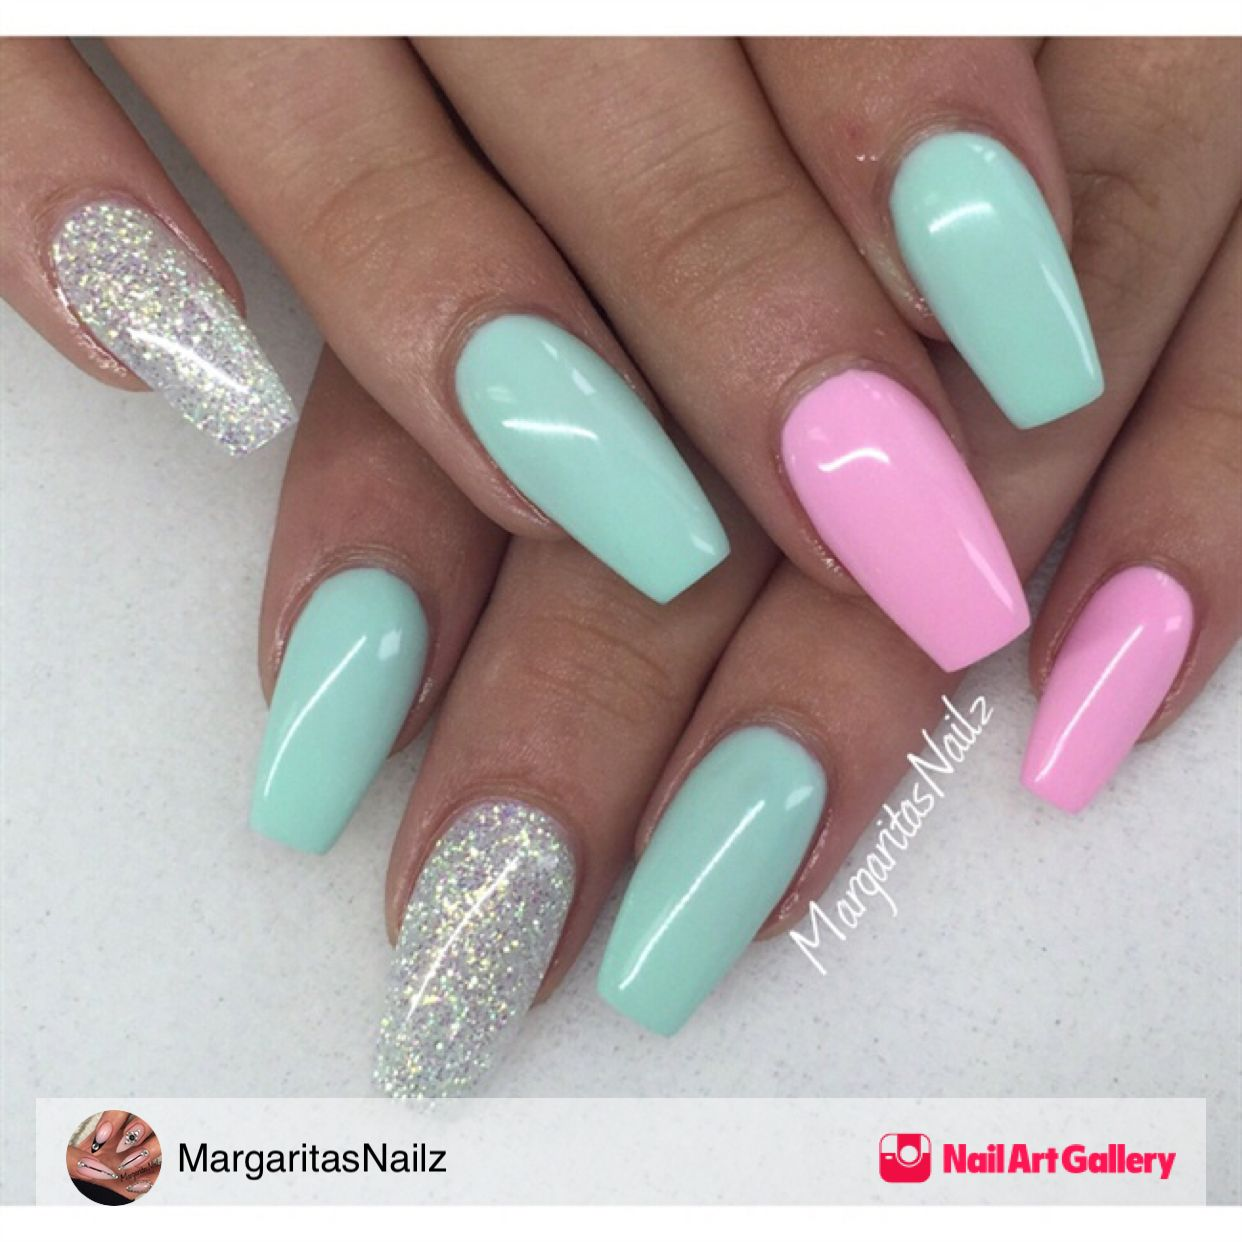 Summer nails by margaritasnailz via nail art gallery - Pinterest nageldesign ...